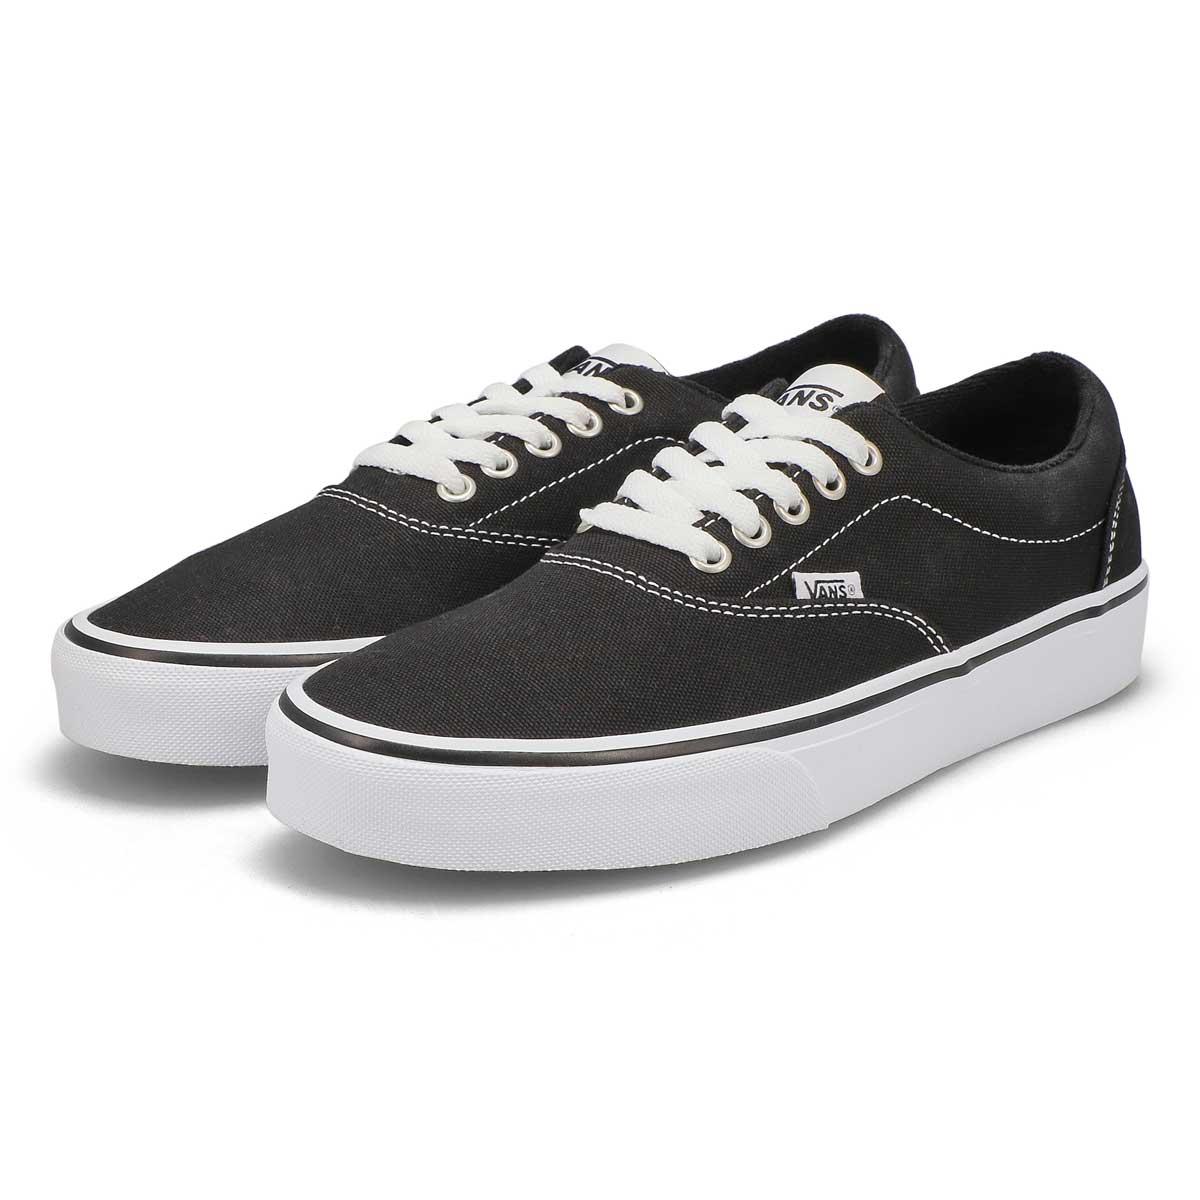 Men's Doheny Sneaker - Black/White